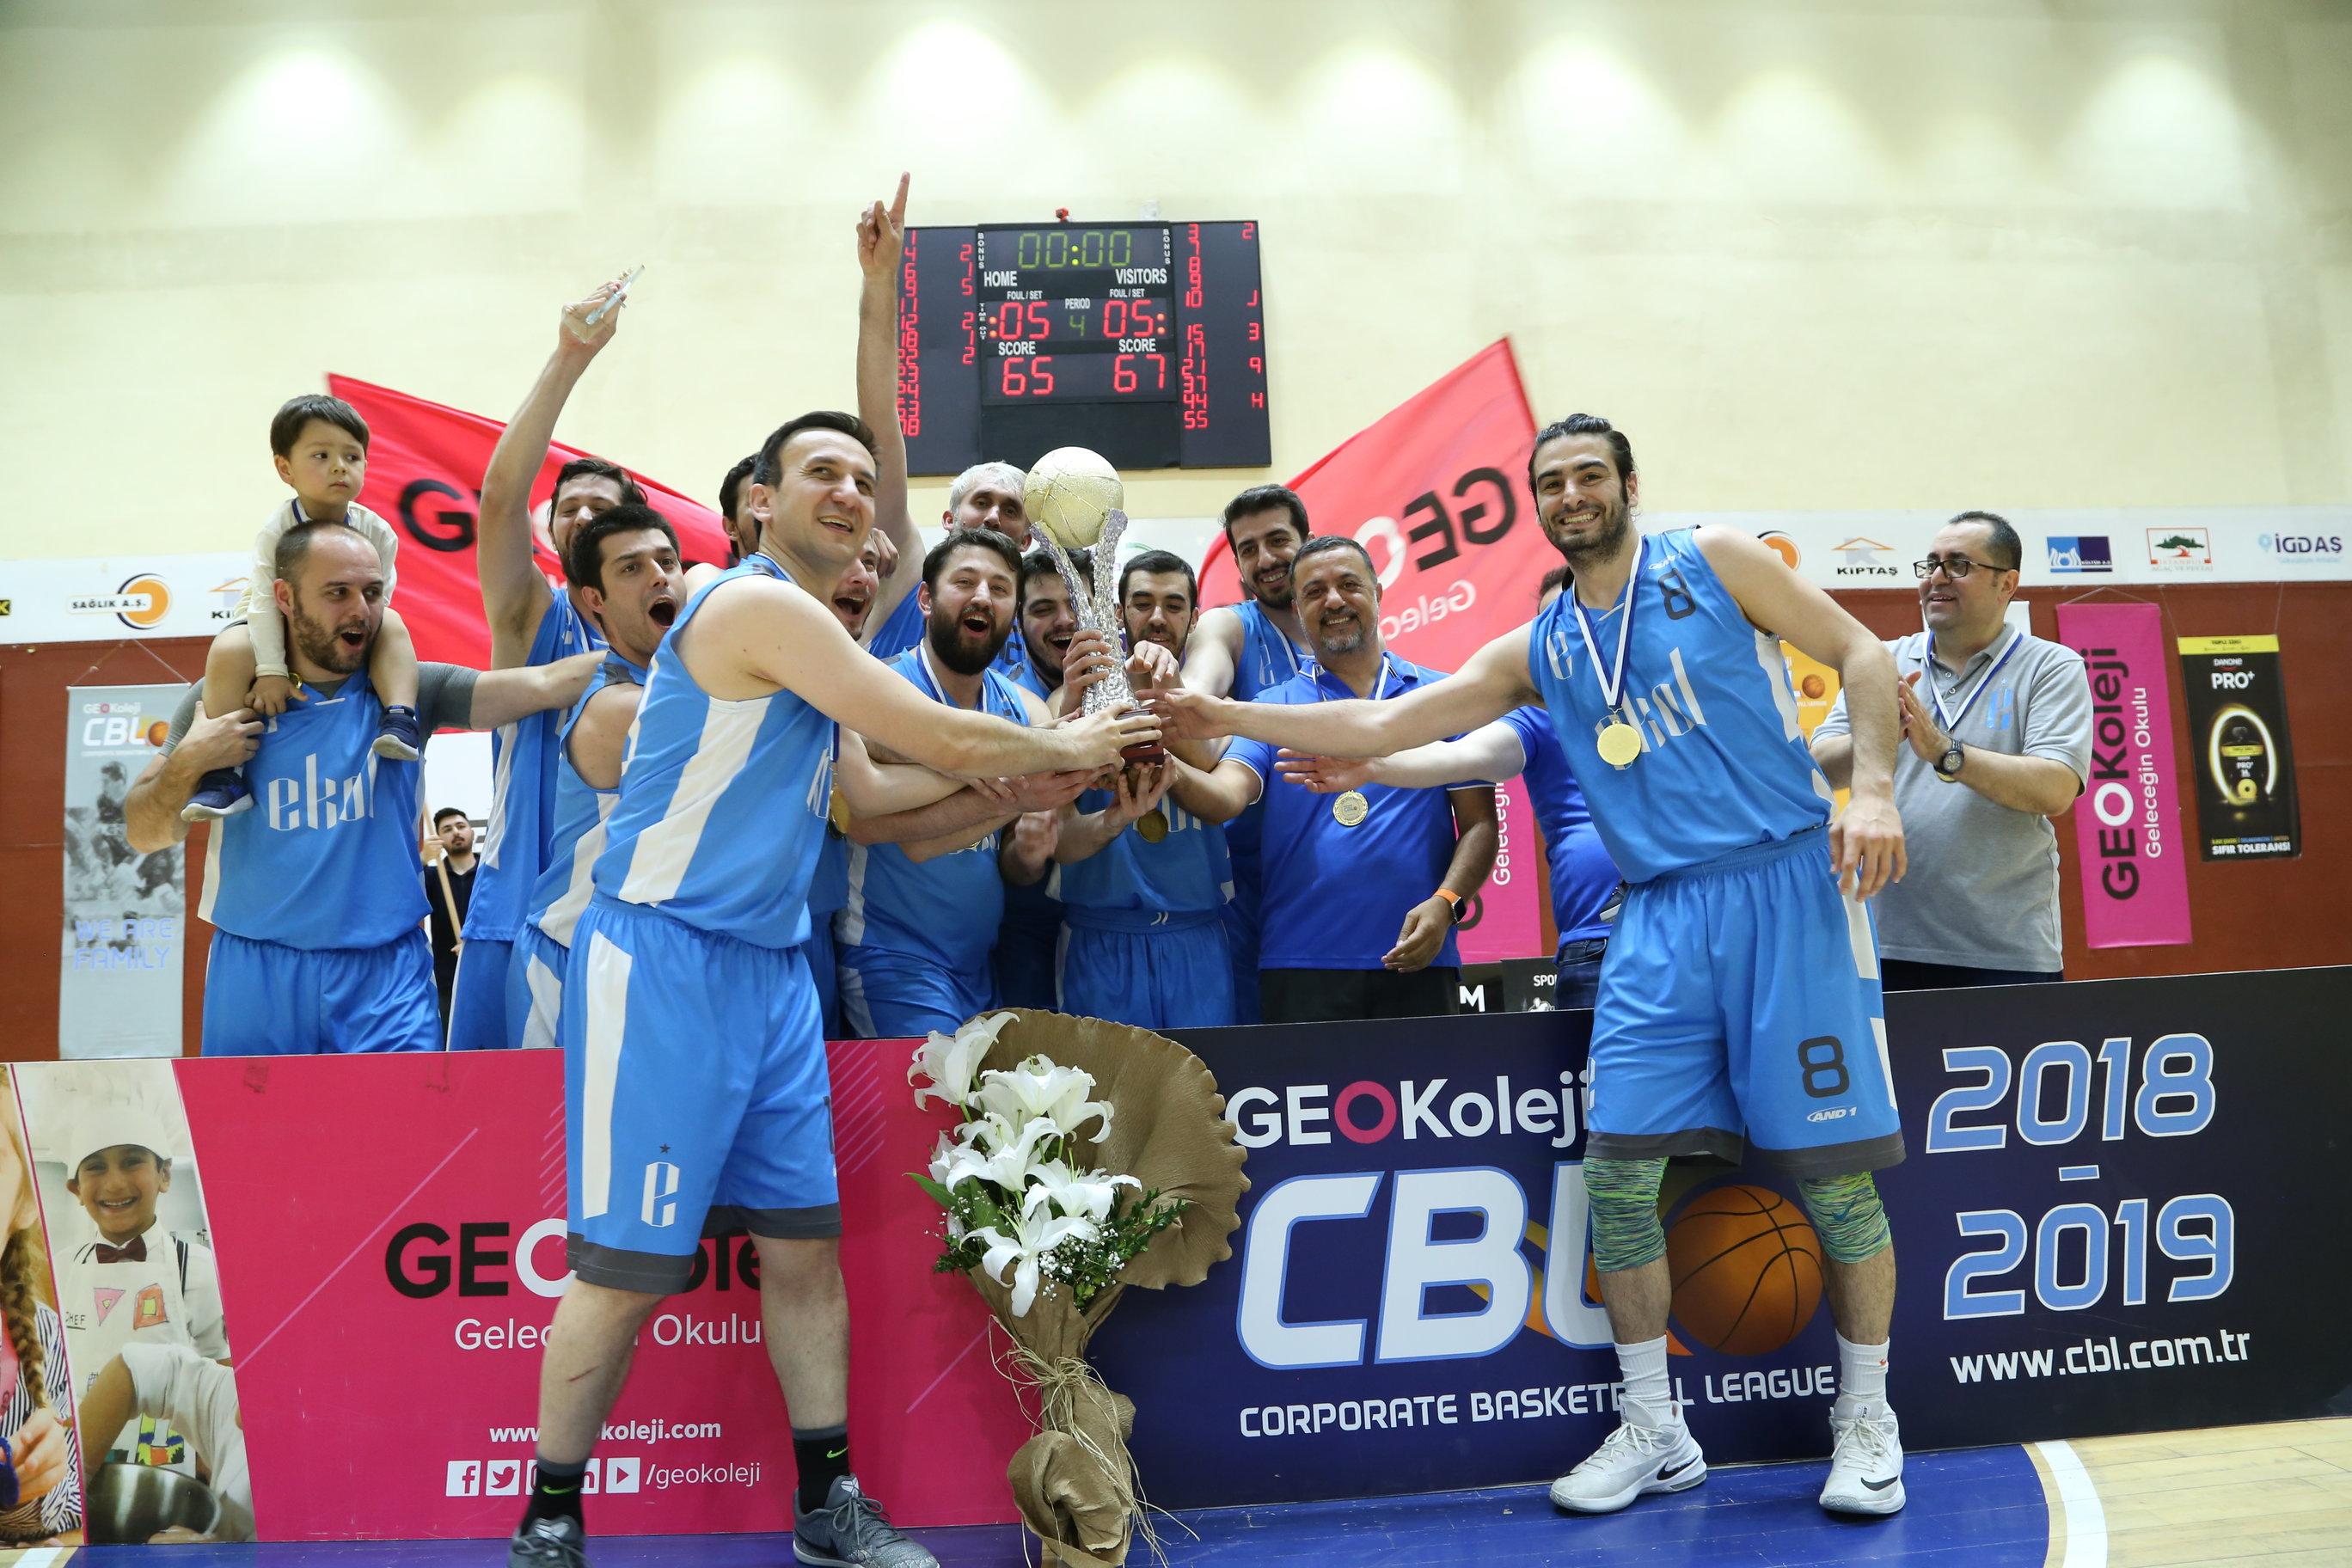 CBL 2019 Şampiyonu Ekol!